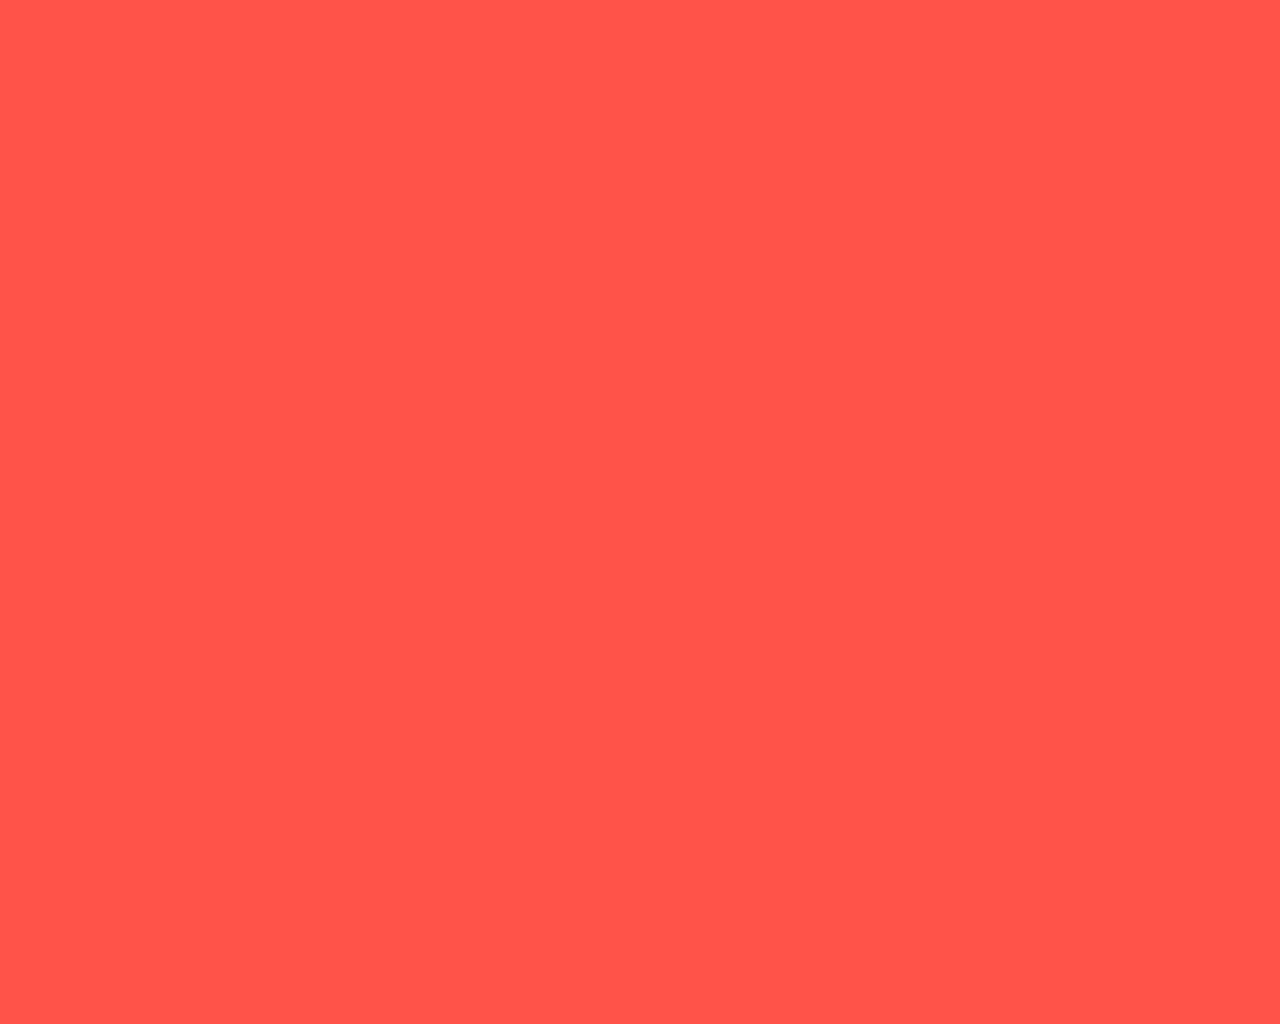 1280x1024 Red-orange Solid Color Background